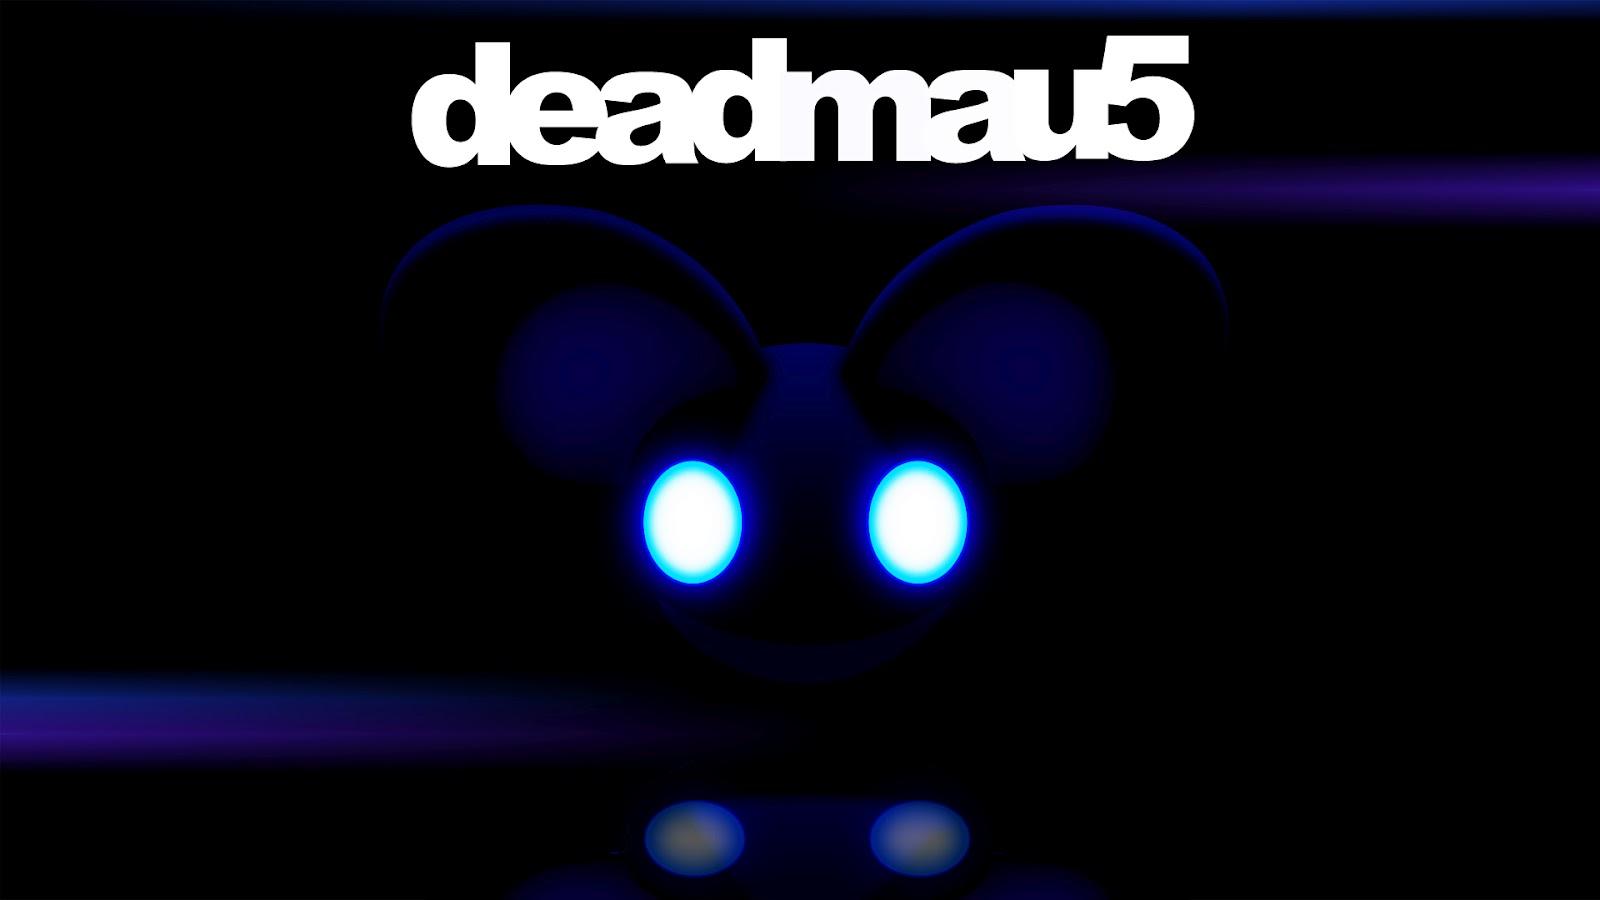 Neon Wallpaper Hd 3d Deadmau5 Wallpaper Deadmau5 Wallpaper